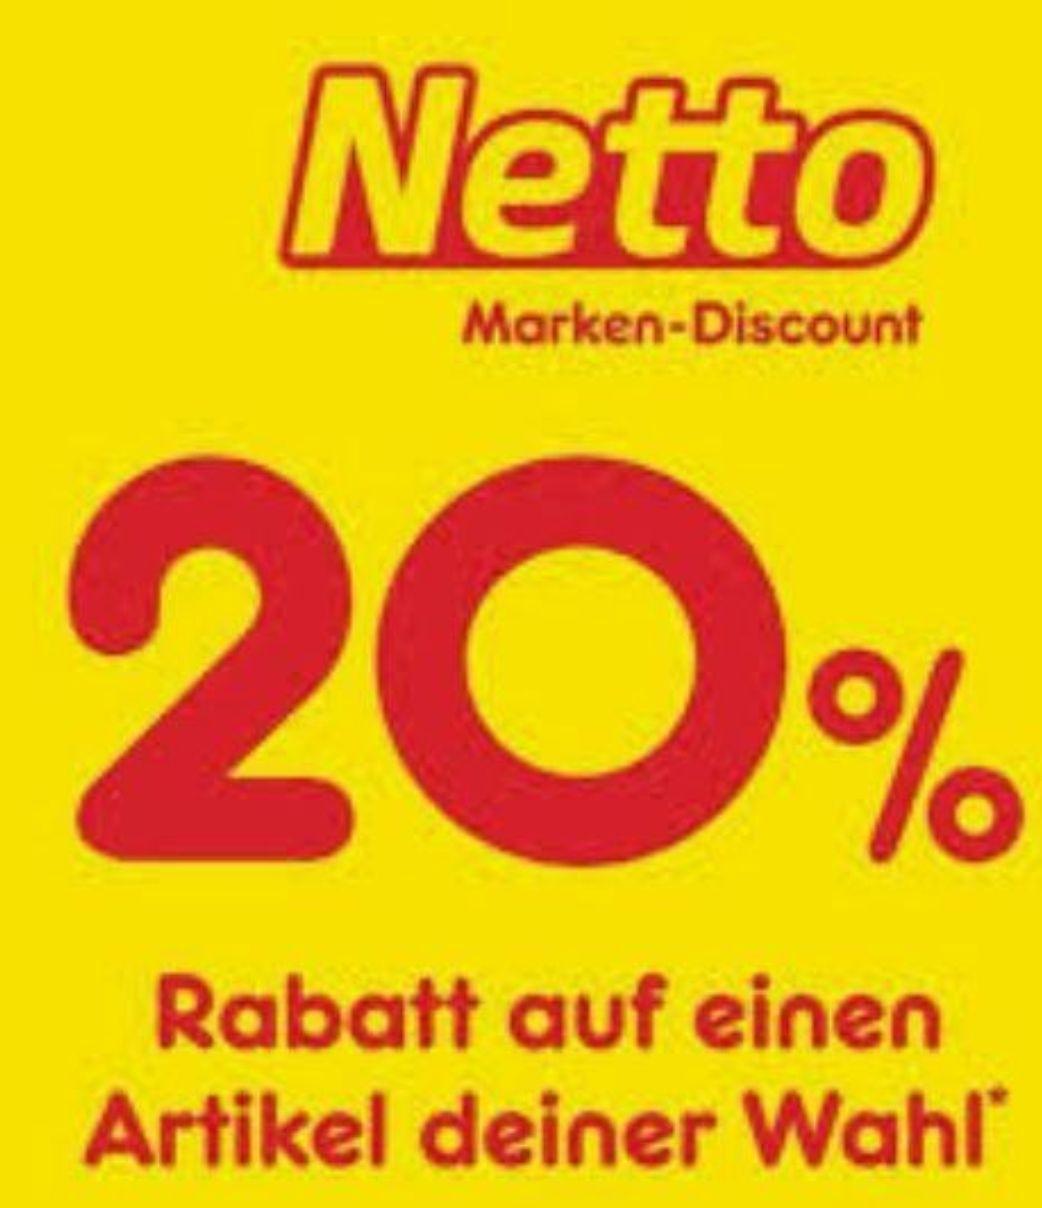 [Netto MD] Rabatt-Coupons KW35 (24.08. - 29.08.), bundesweit einsetzbar